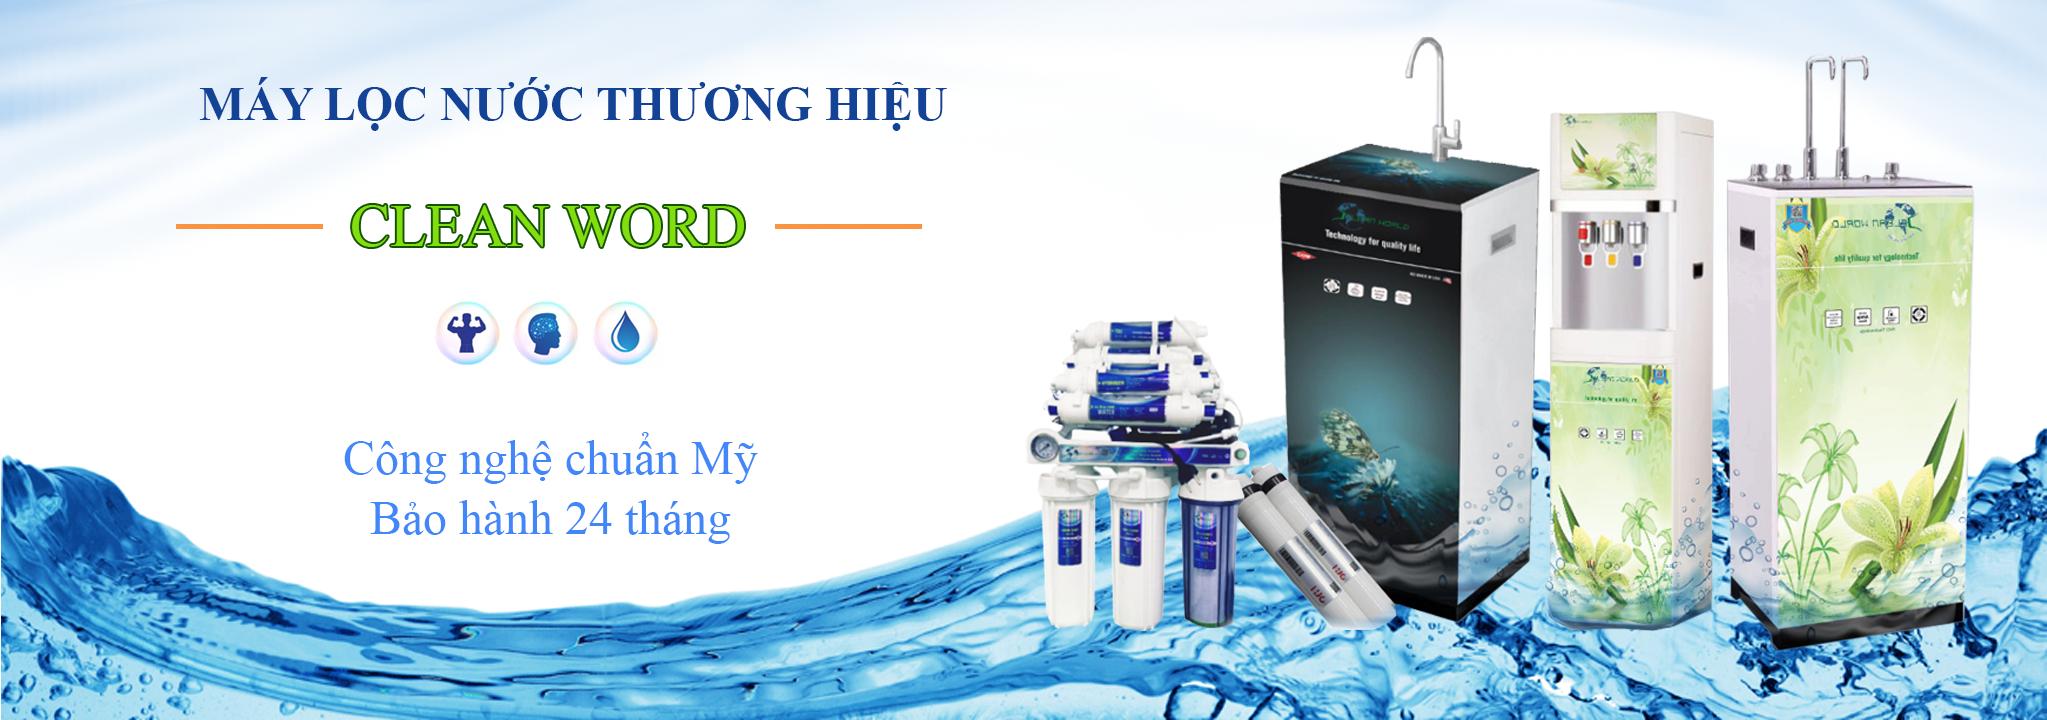 banner4 - Trang Chủ